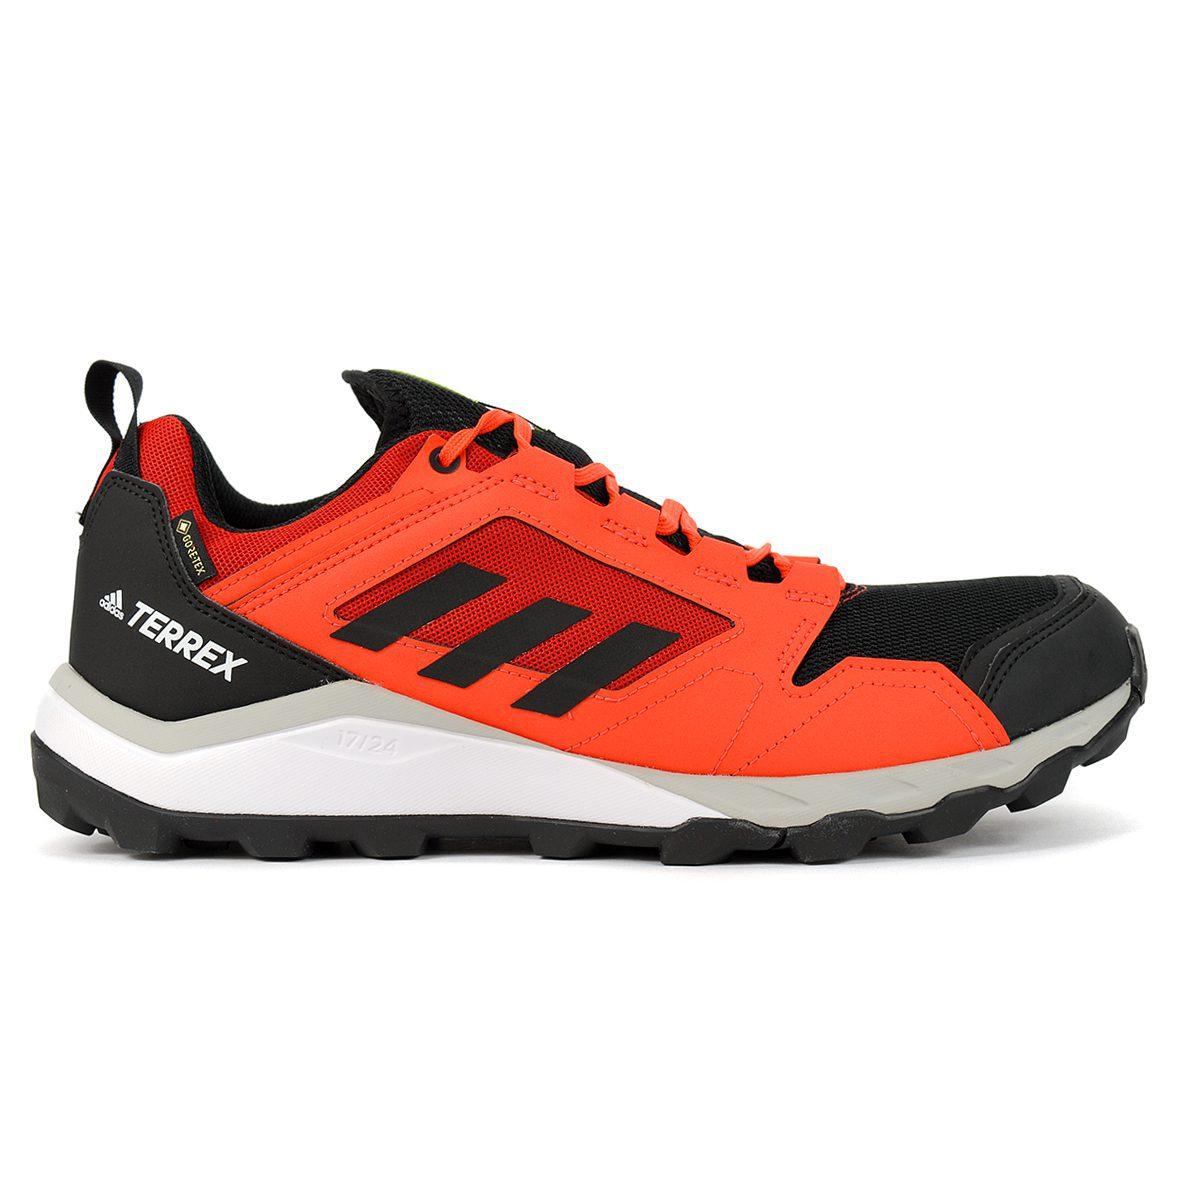 adidas Men's Terrex Agravic TR GTX Solar Red/Black/Grey Trail ...